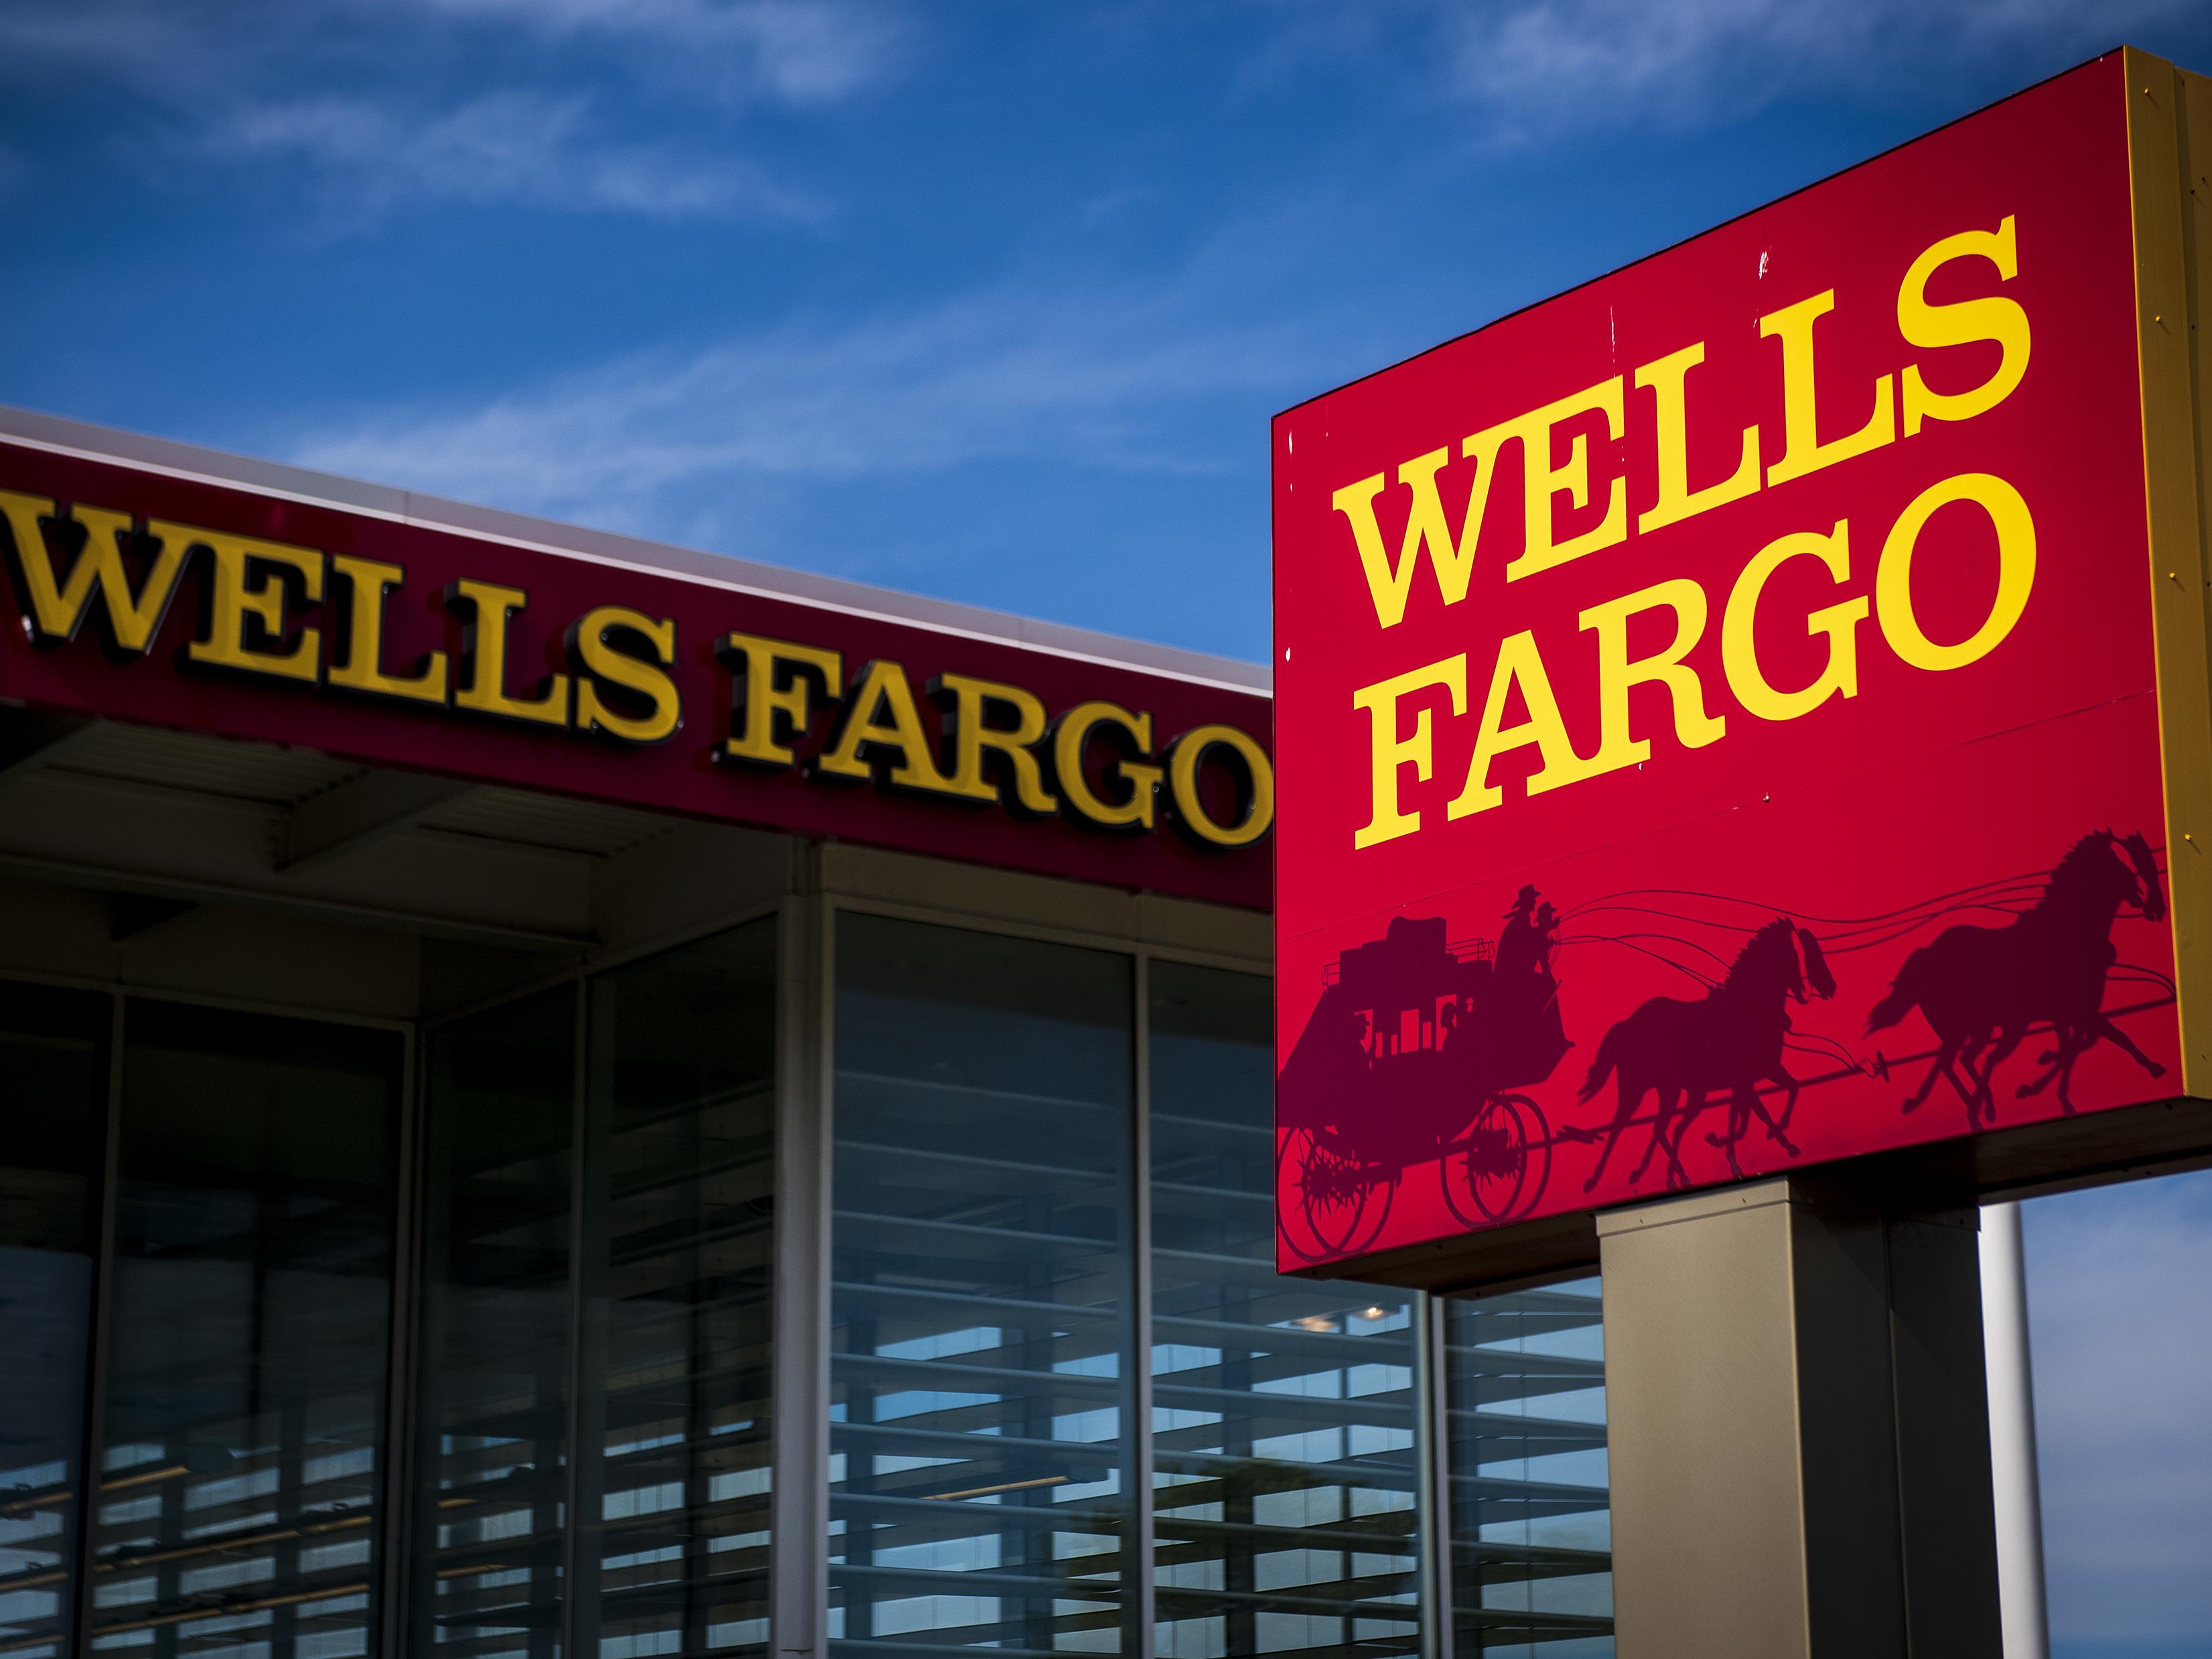 Wells Fargo Paying $3 Billion To Settle U.S. Case Over Fraudulent Customer Accounts